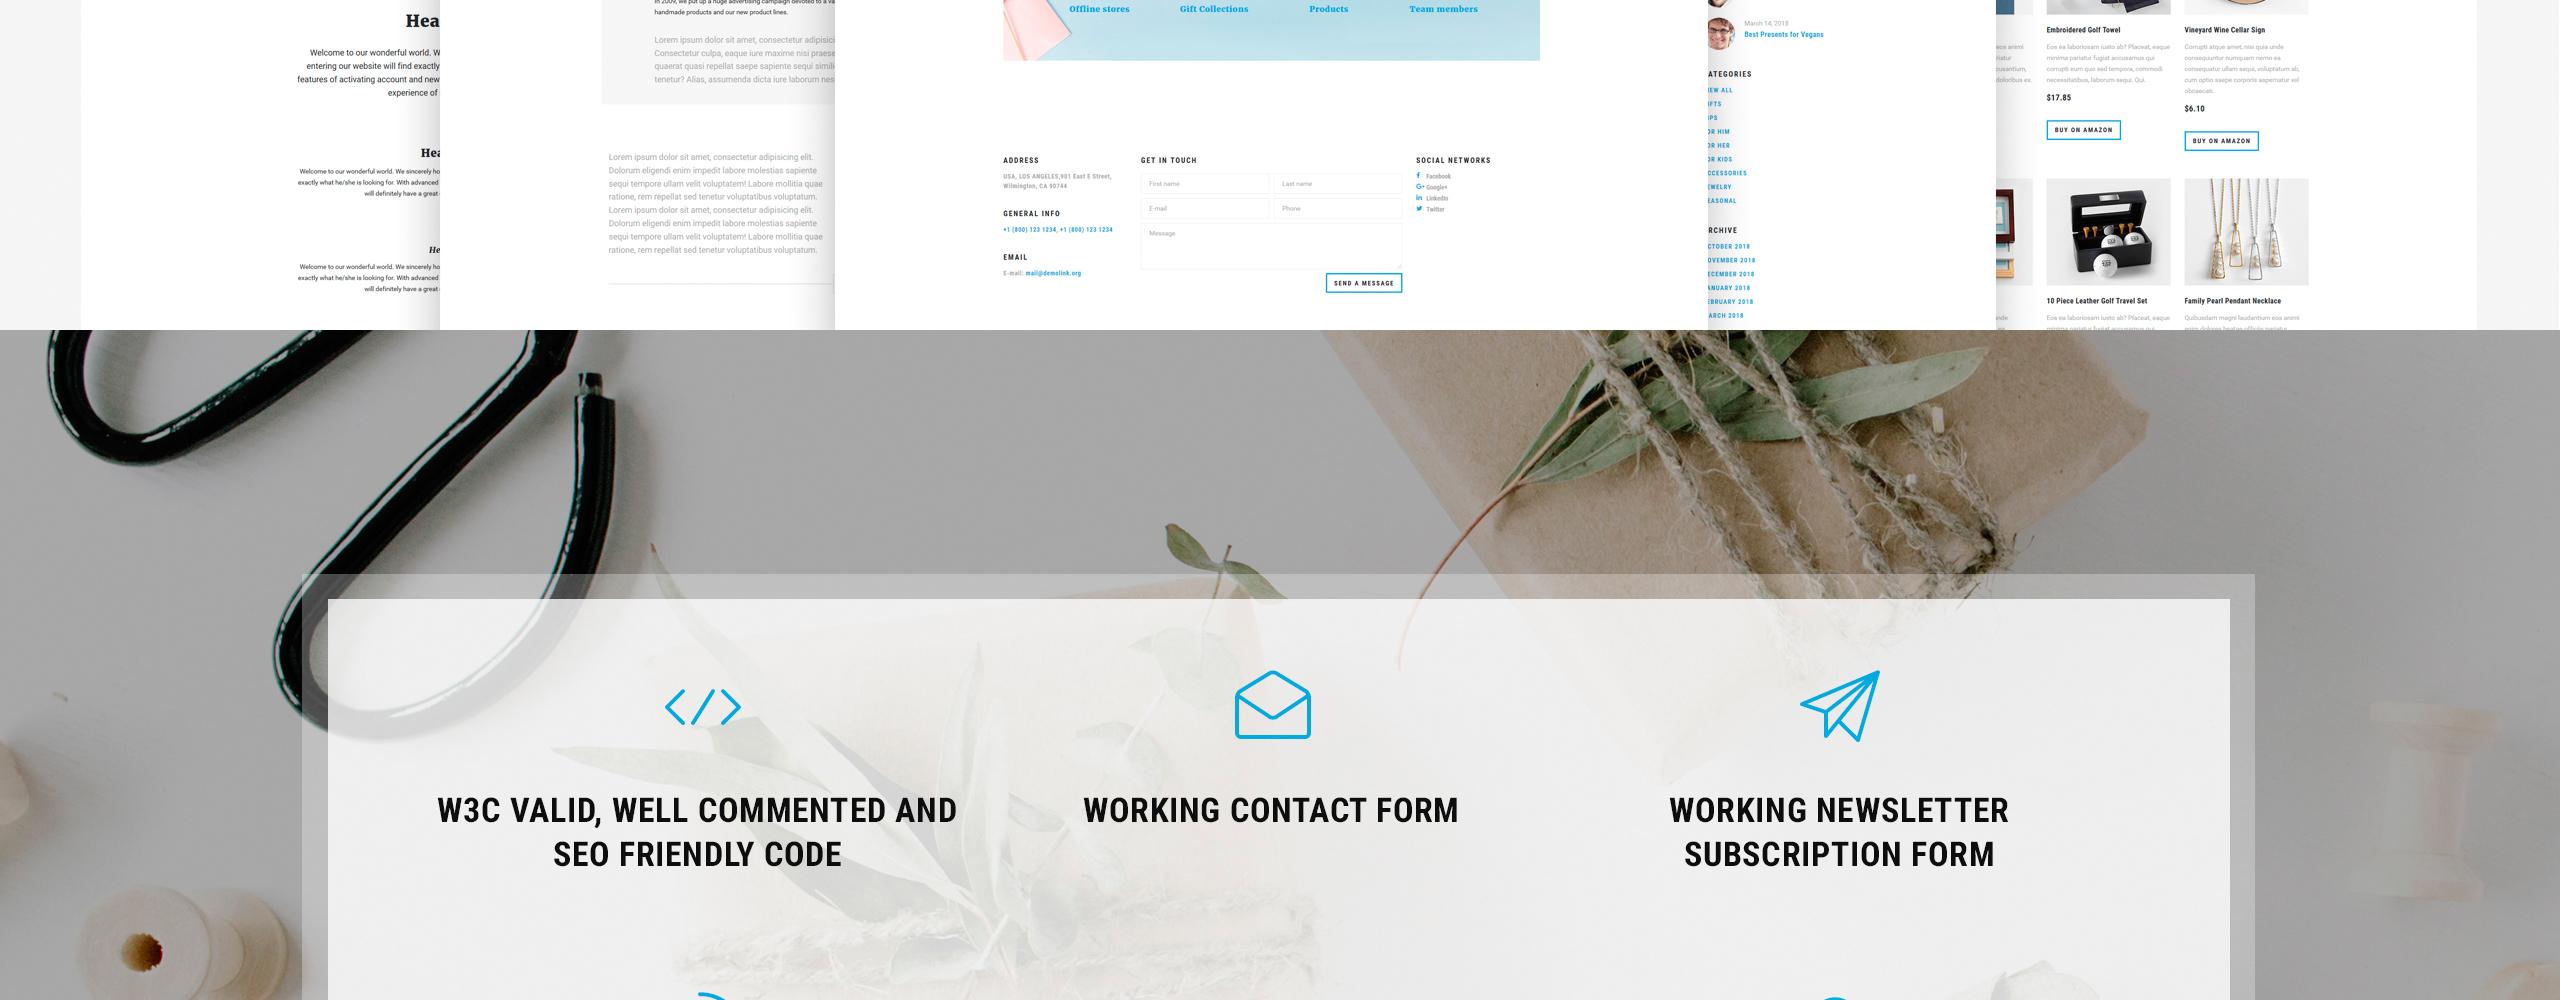 Gift Box Website Template